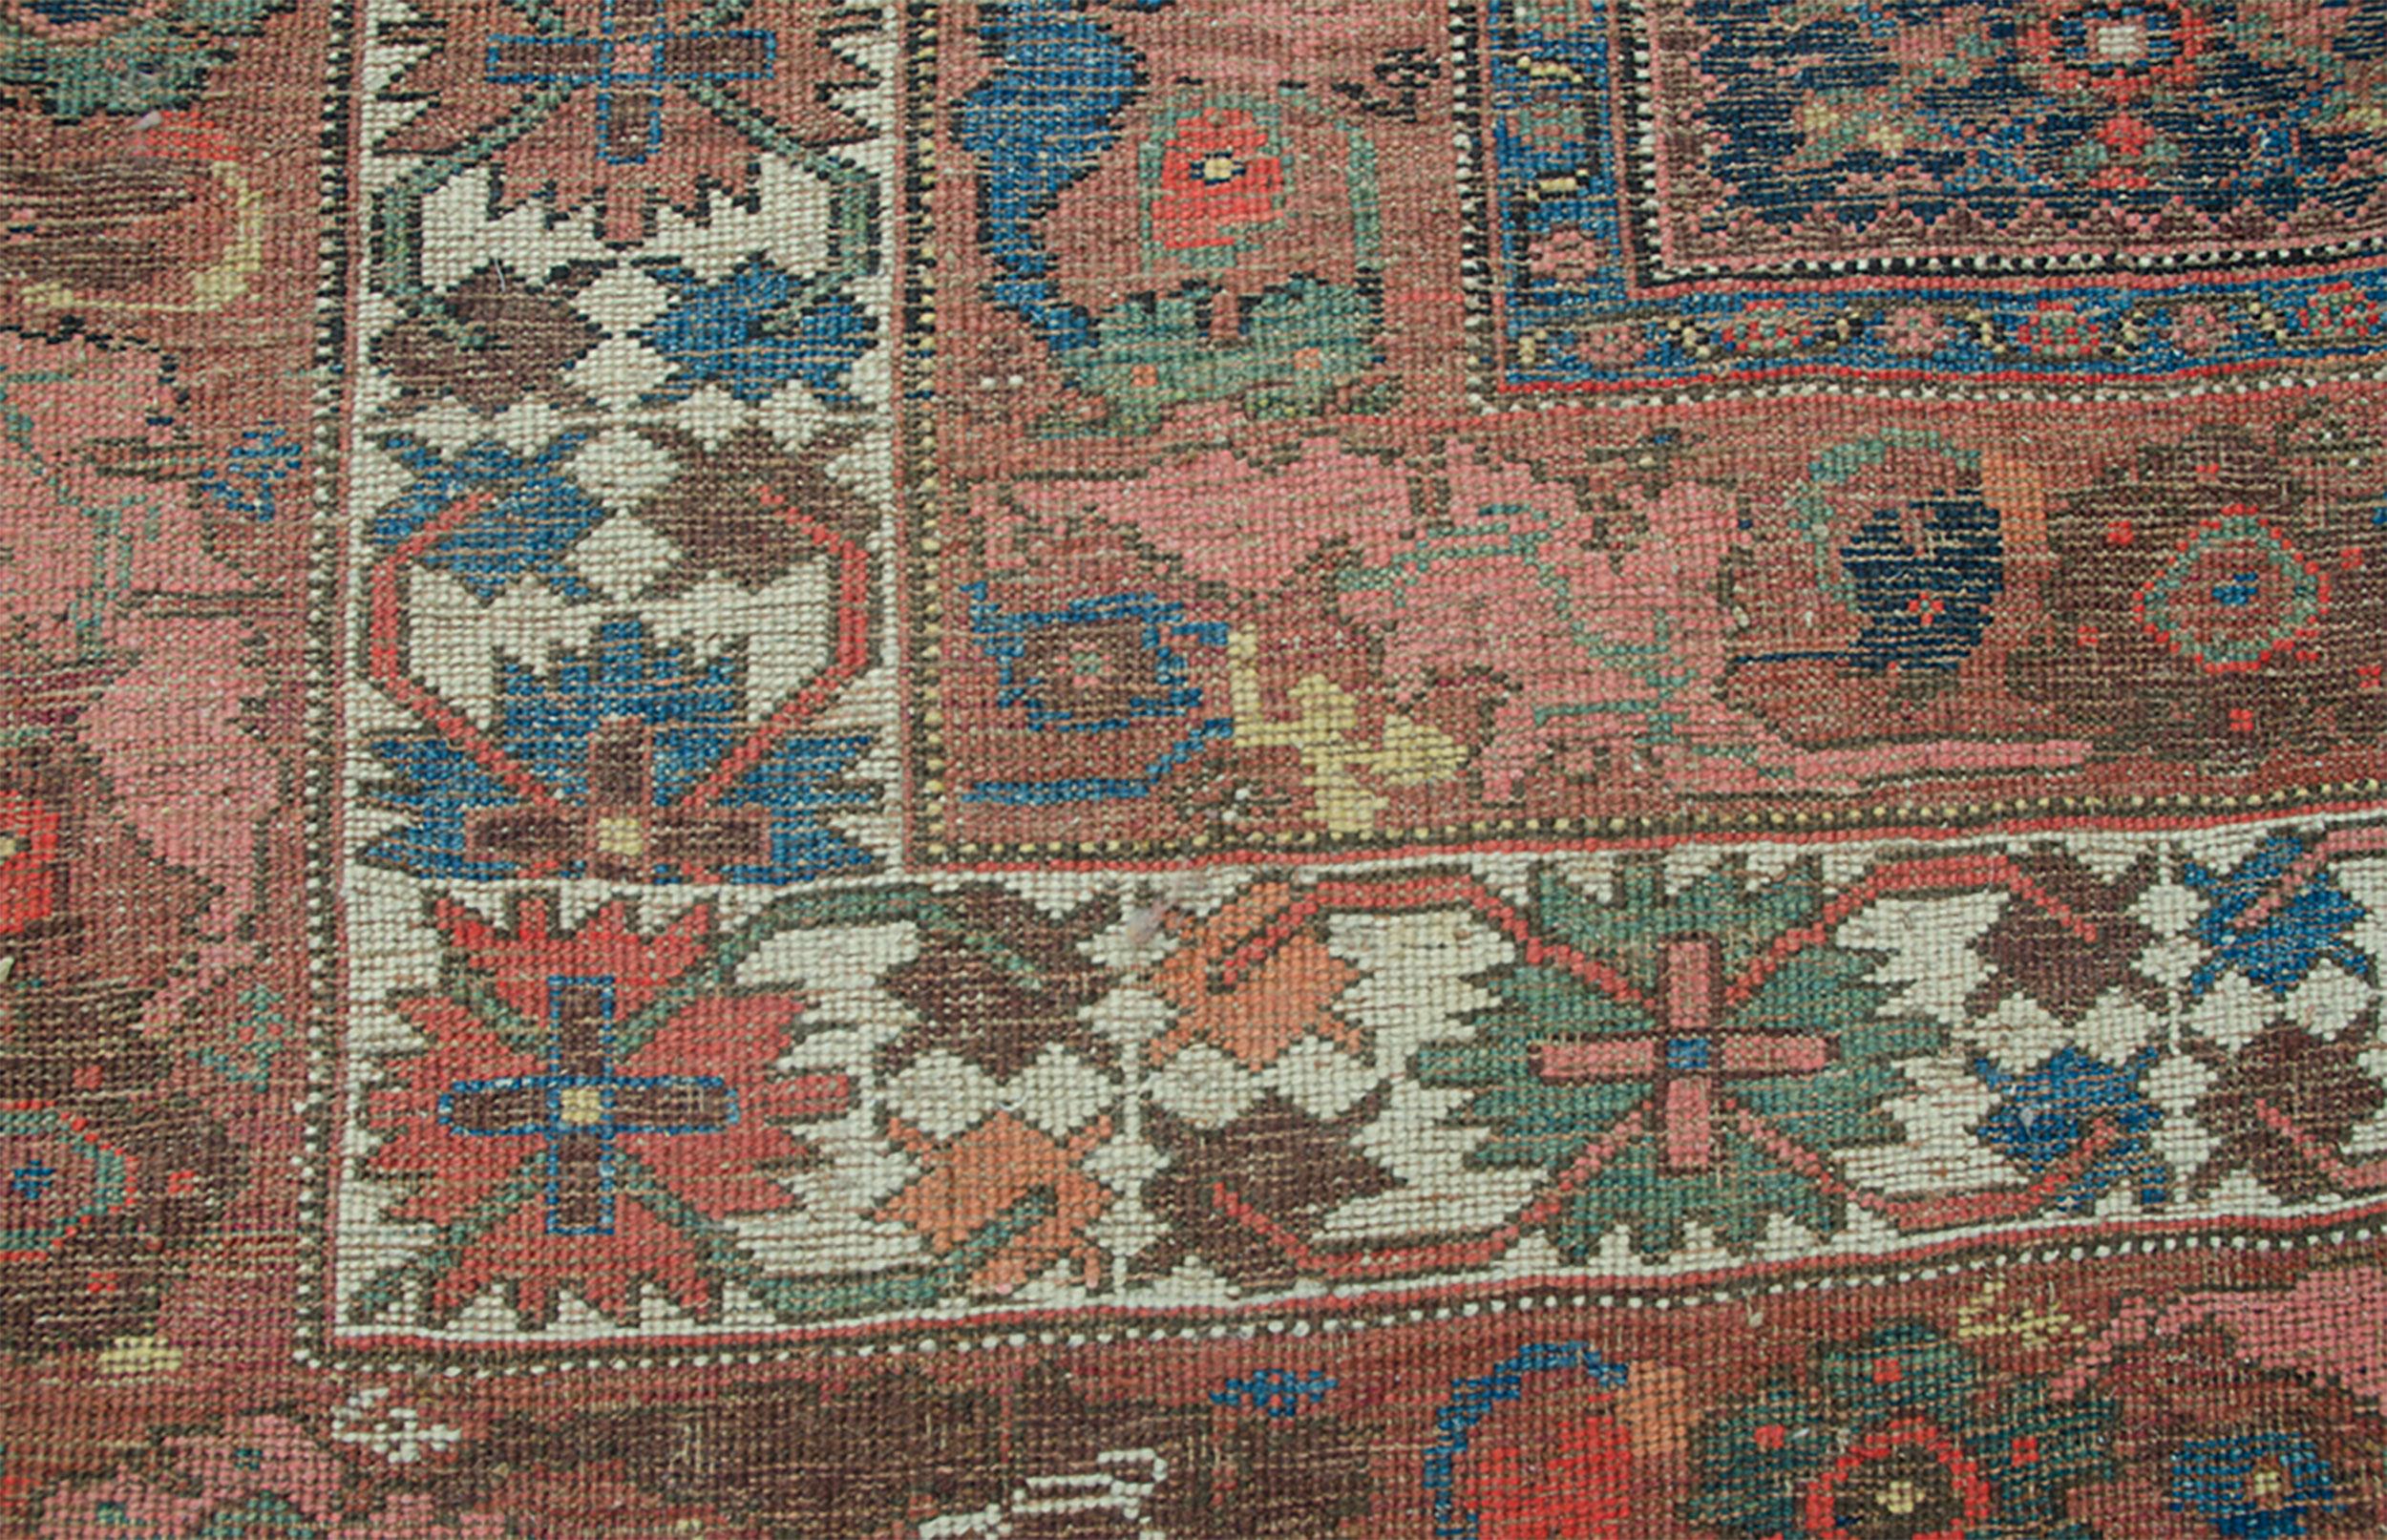 Antique Bijar Carpet 570x236cm